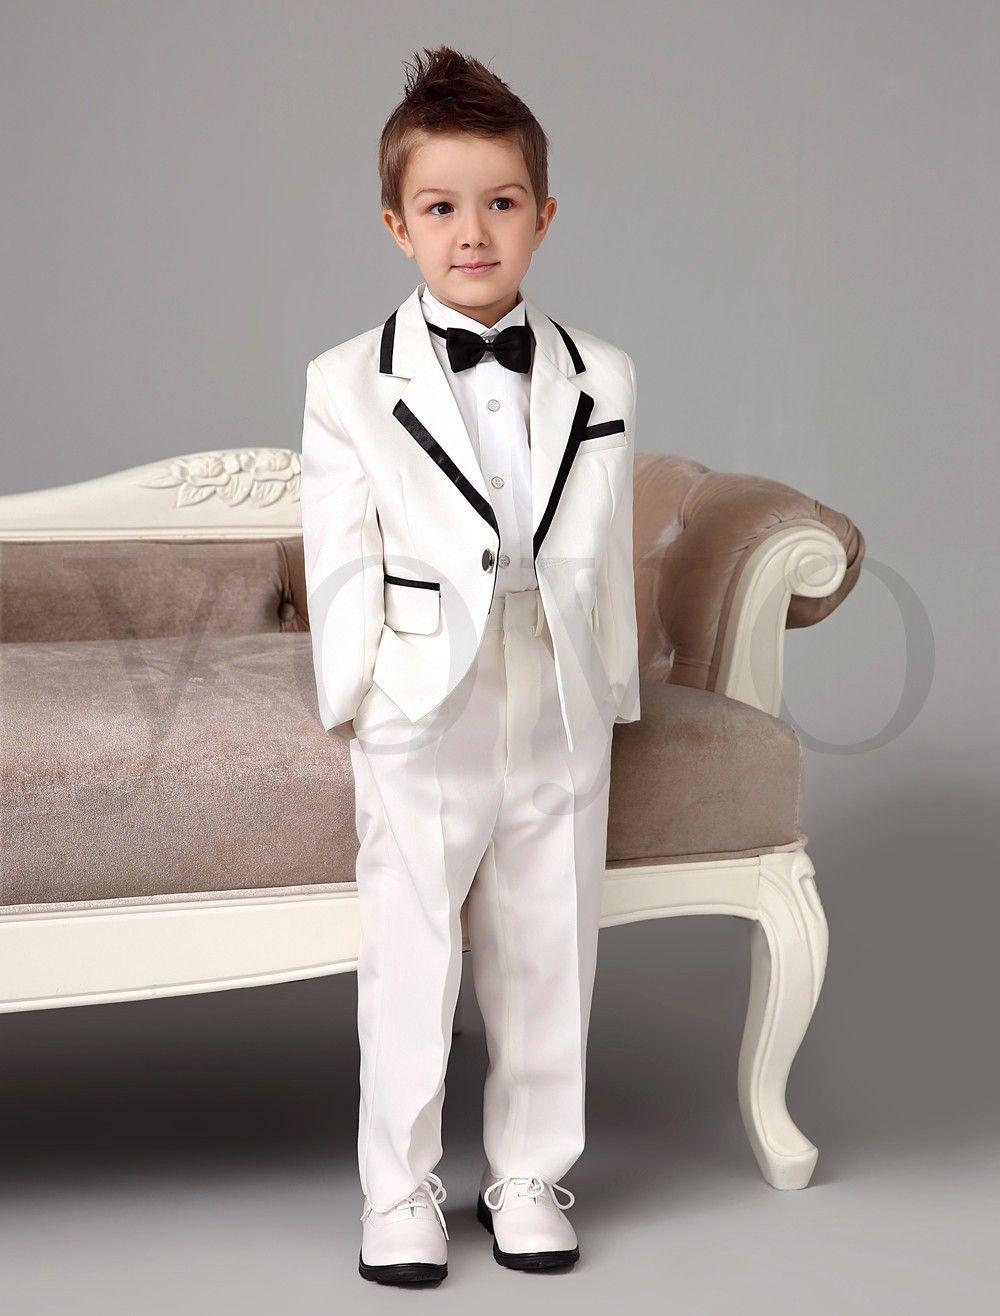 2019 Wholesale 2015 Autumn New Boys White Tuxedos Wedding Attire Baby Boy Dress Clothes Wedding Coat Pants Tie Boys Wedding Suits From Diaolan